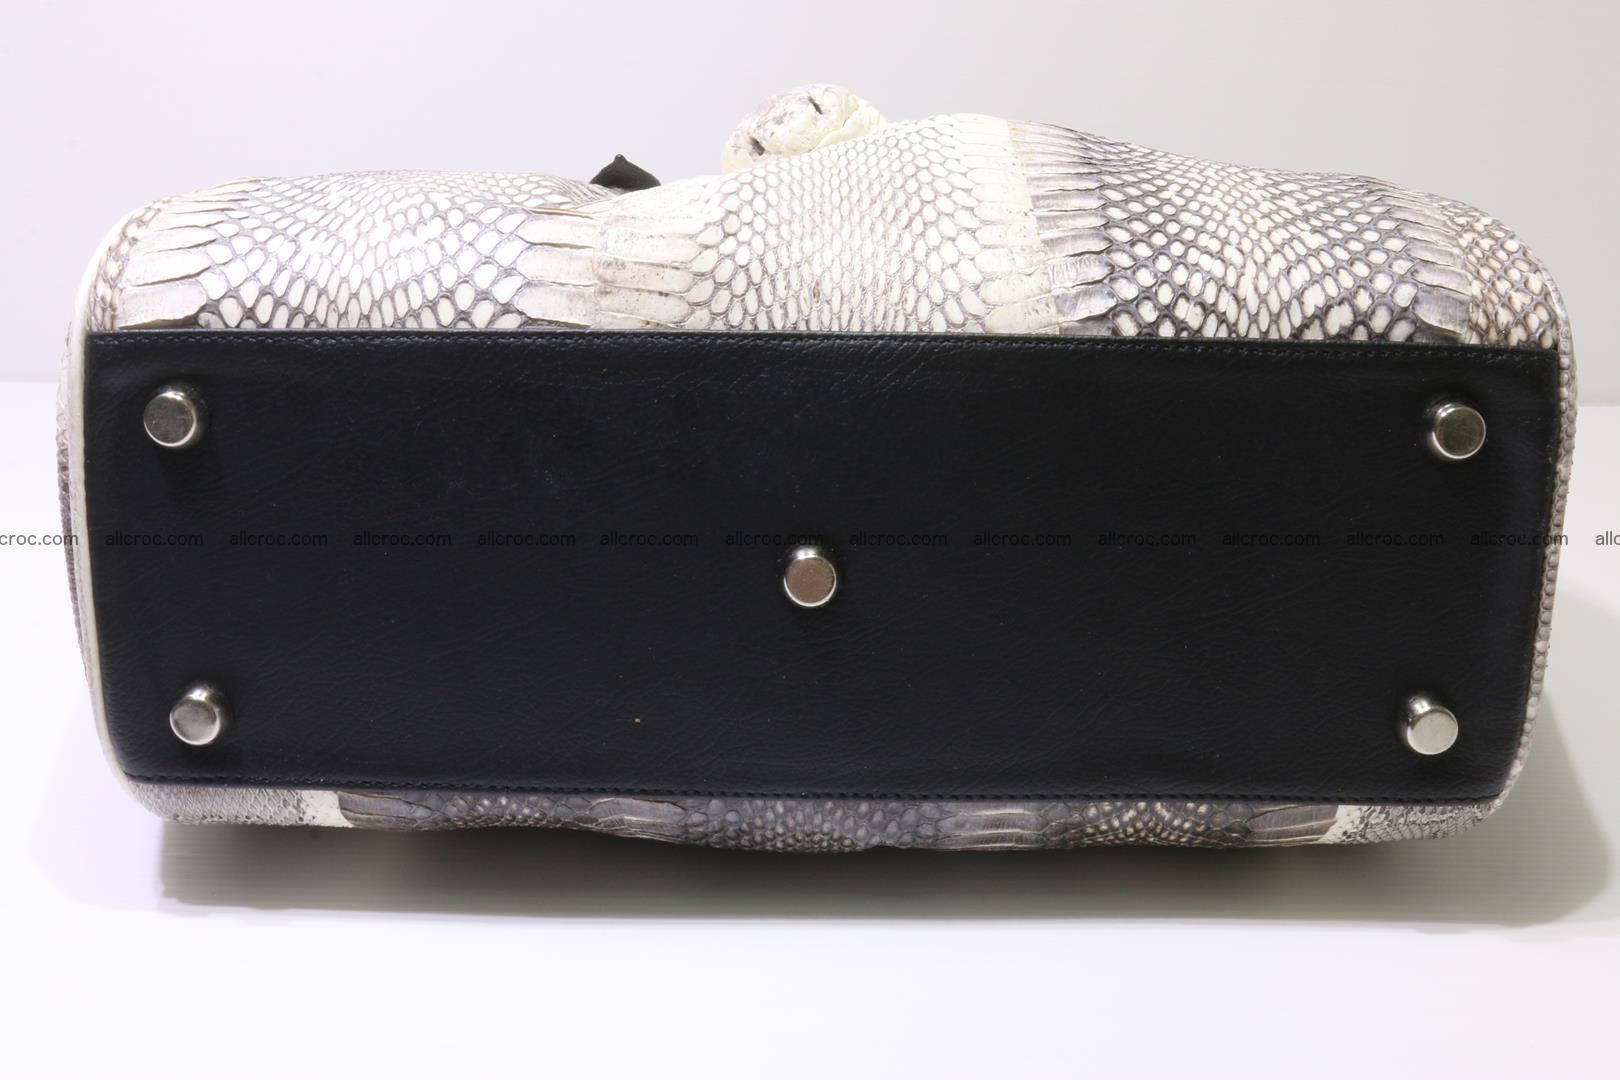 Cobra skin ladies handbag with head of cobra 192 Foto 7